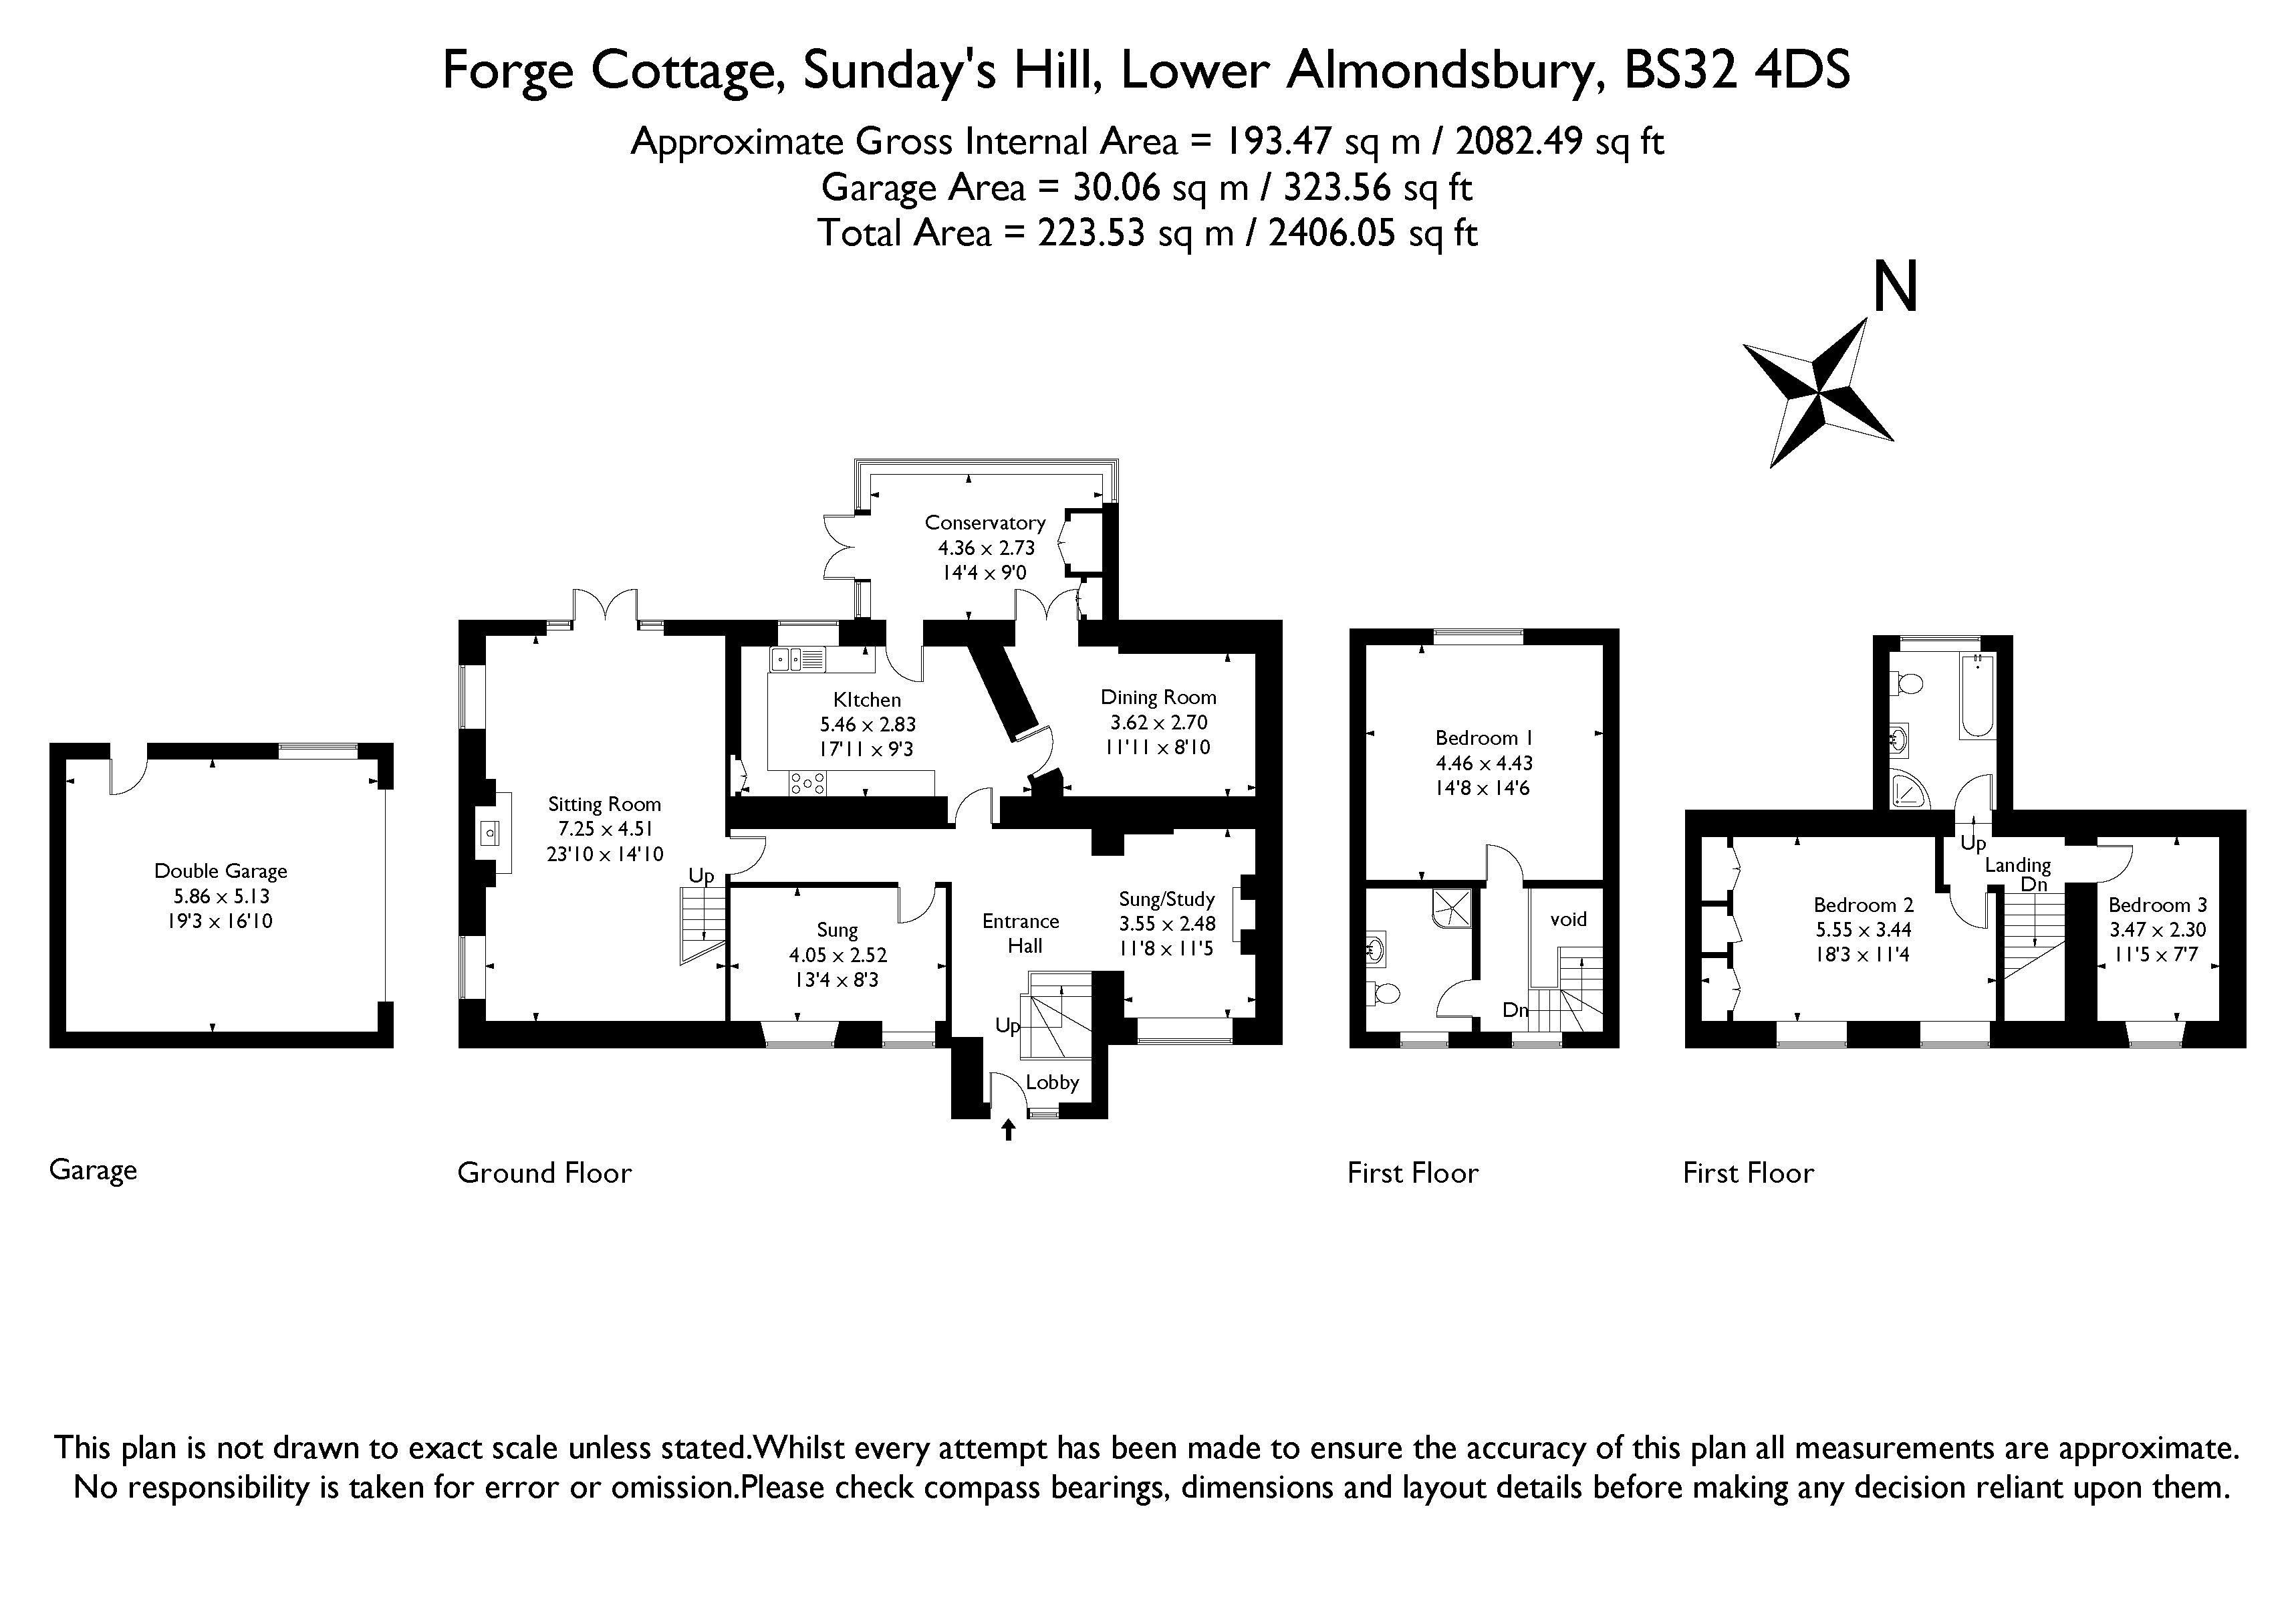 Sundays Hill Almondsbury